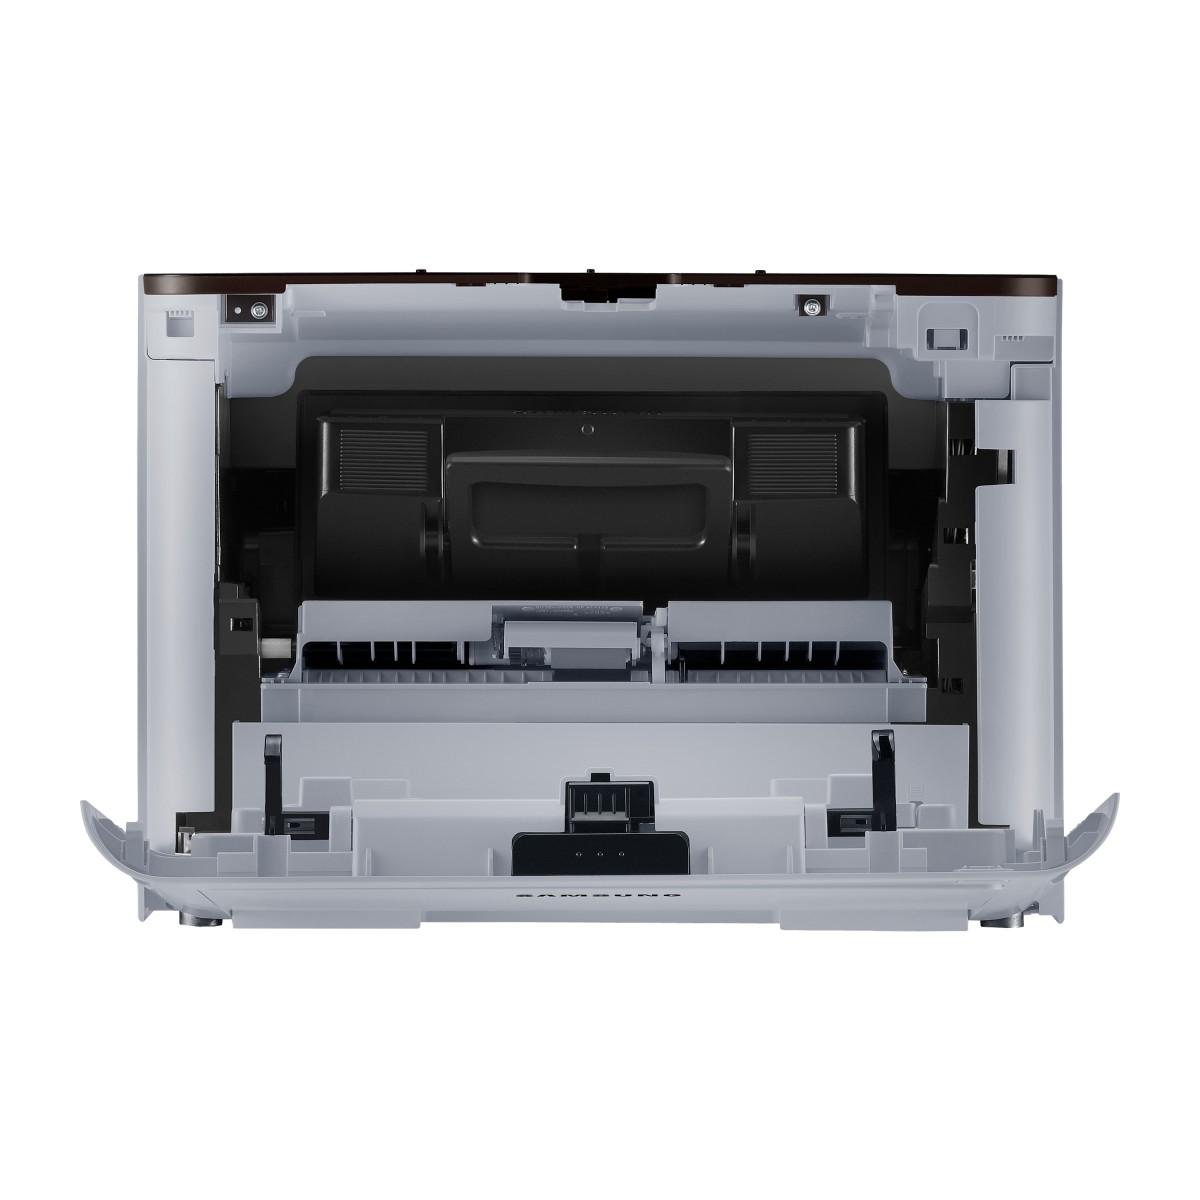 Impressora Multifuncional Samsung ProXpress SL-M4020ND Laser  - ShopNoroeste.com.br